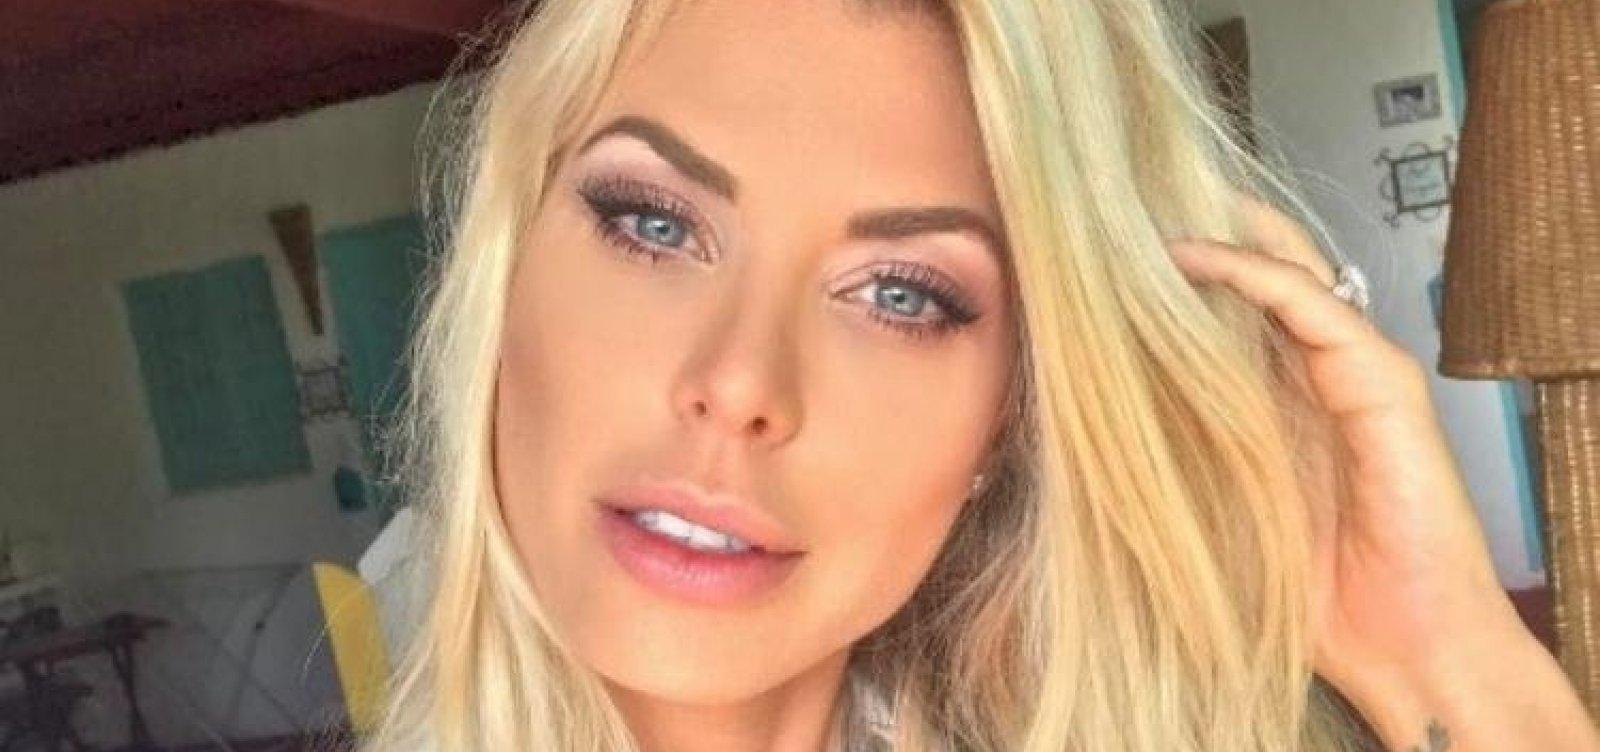 [Polícia indicia marido de Caroline Bittencourt por homicídio culposo]